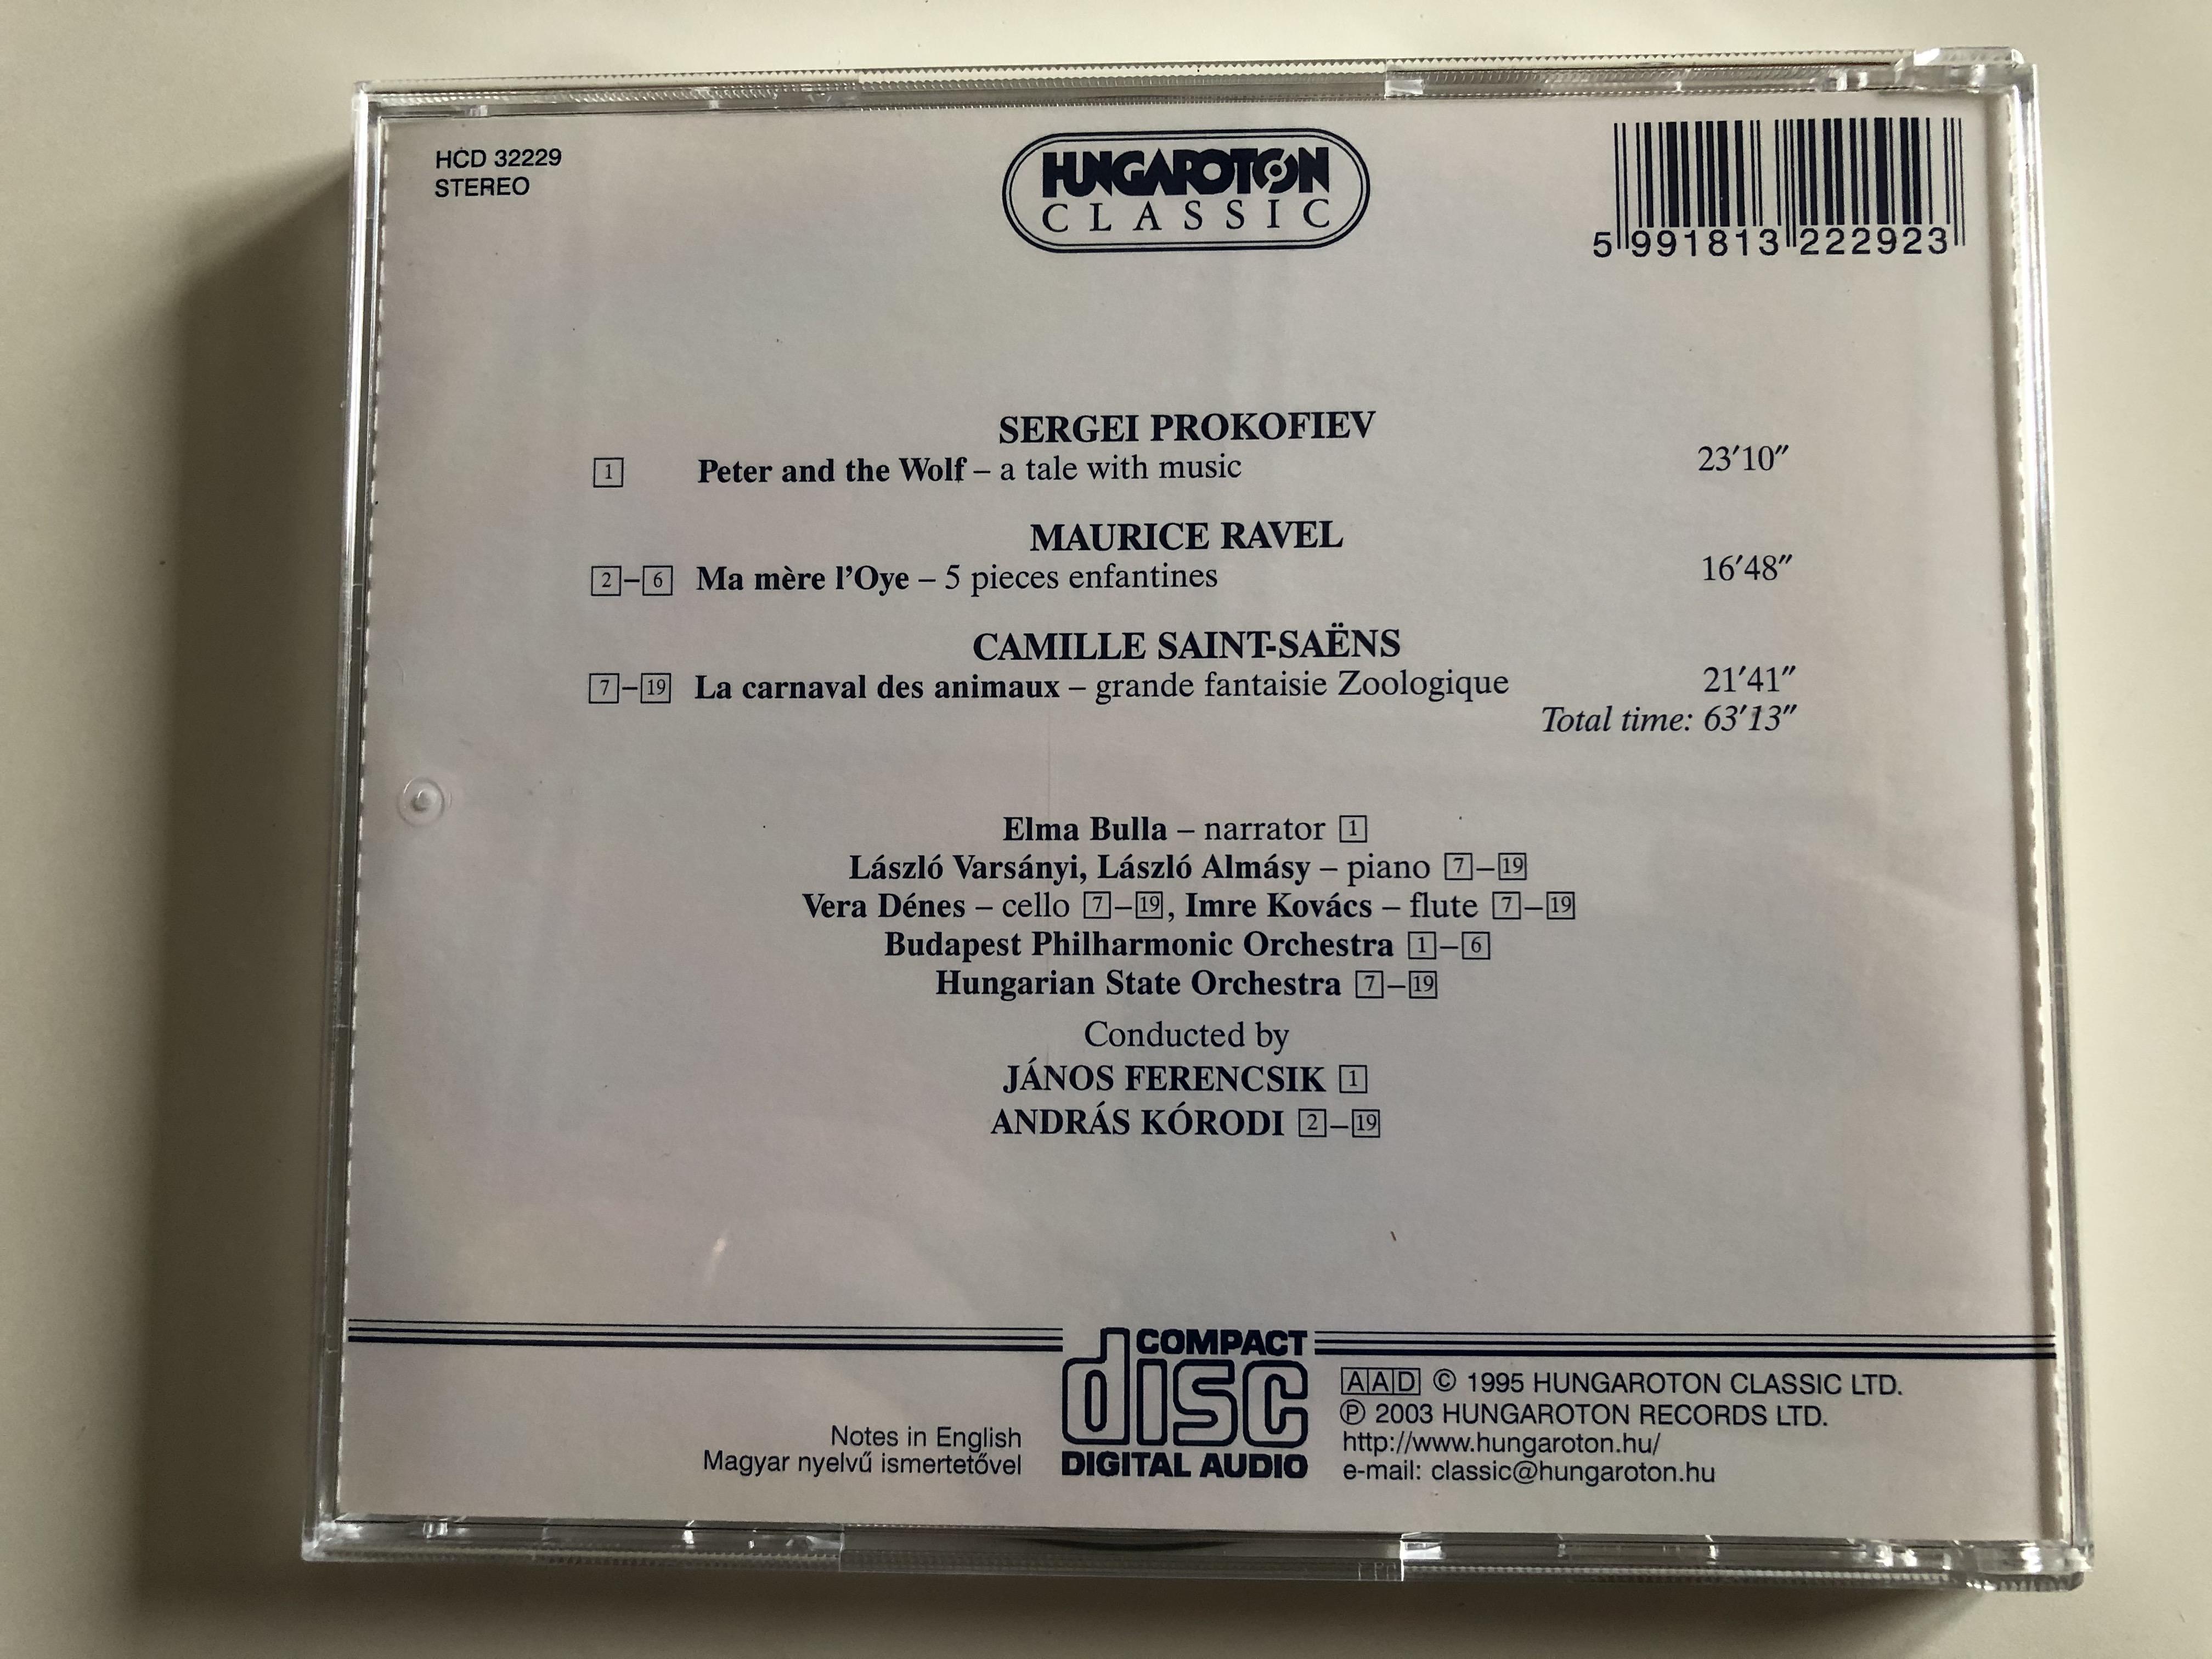 prokofiev-peter-and-the-wolf-saint-sa-ns-la-carnaval-des-animaux-ravel-ma-m-re-l-oye-hungaroton-classic-audio-cd-2003-stereo-hcd-32229-8-.jpg